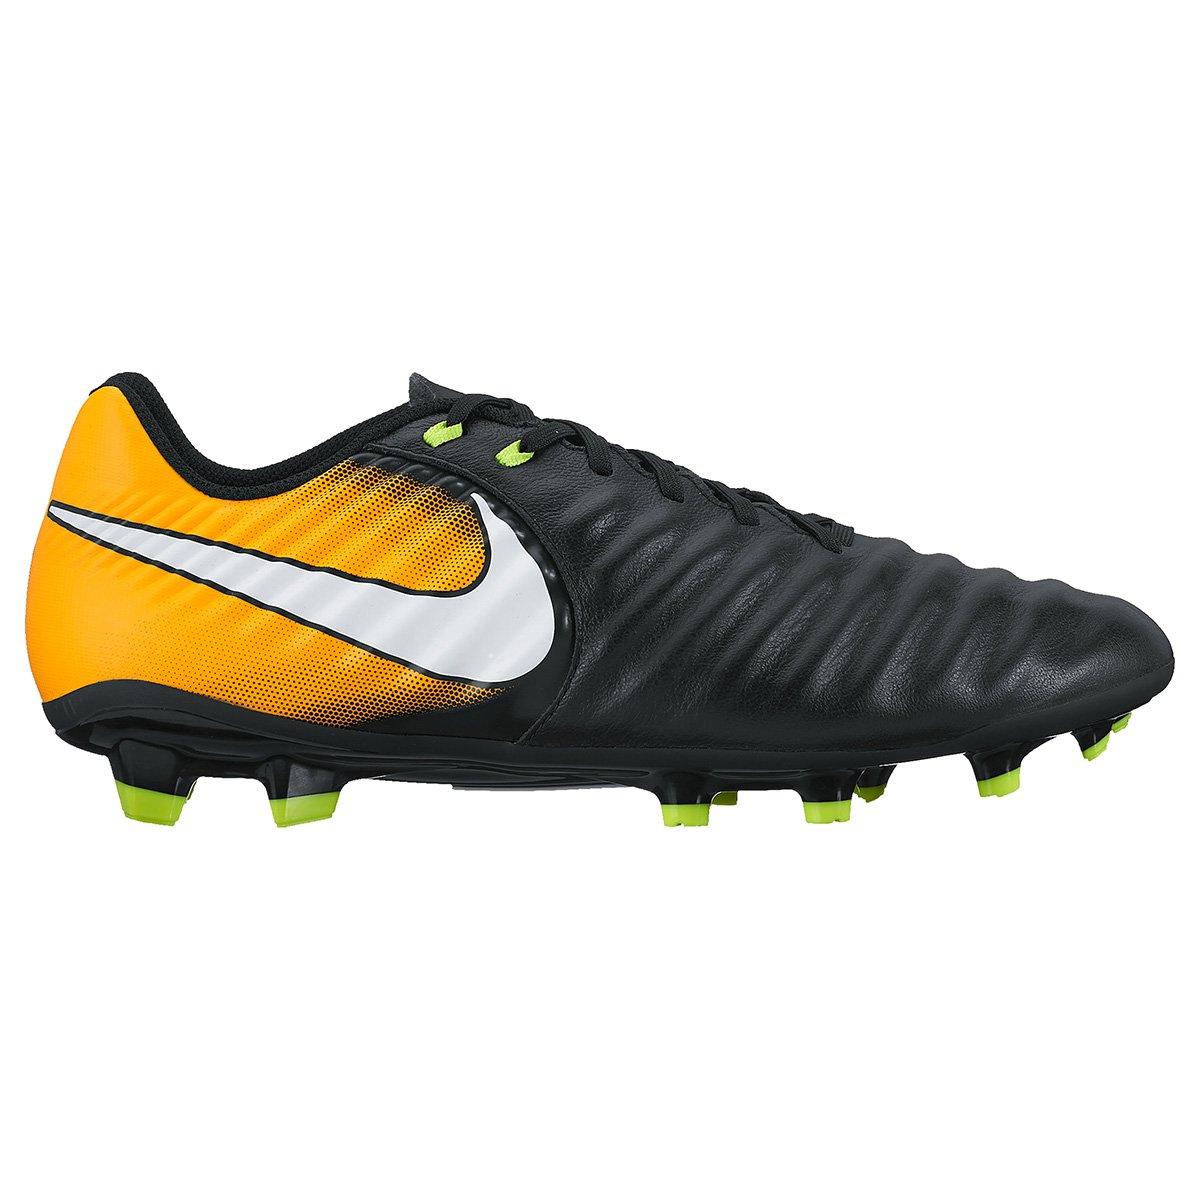 ac8cae1106 Chuteira Campo Nike Tiempo Ligera 4 FG - Preto e Laranja